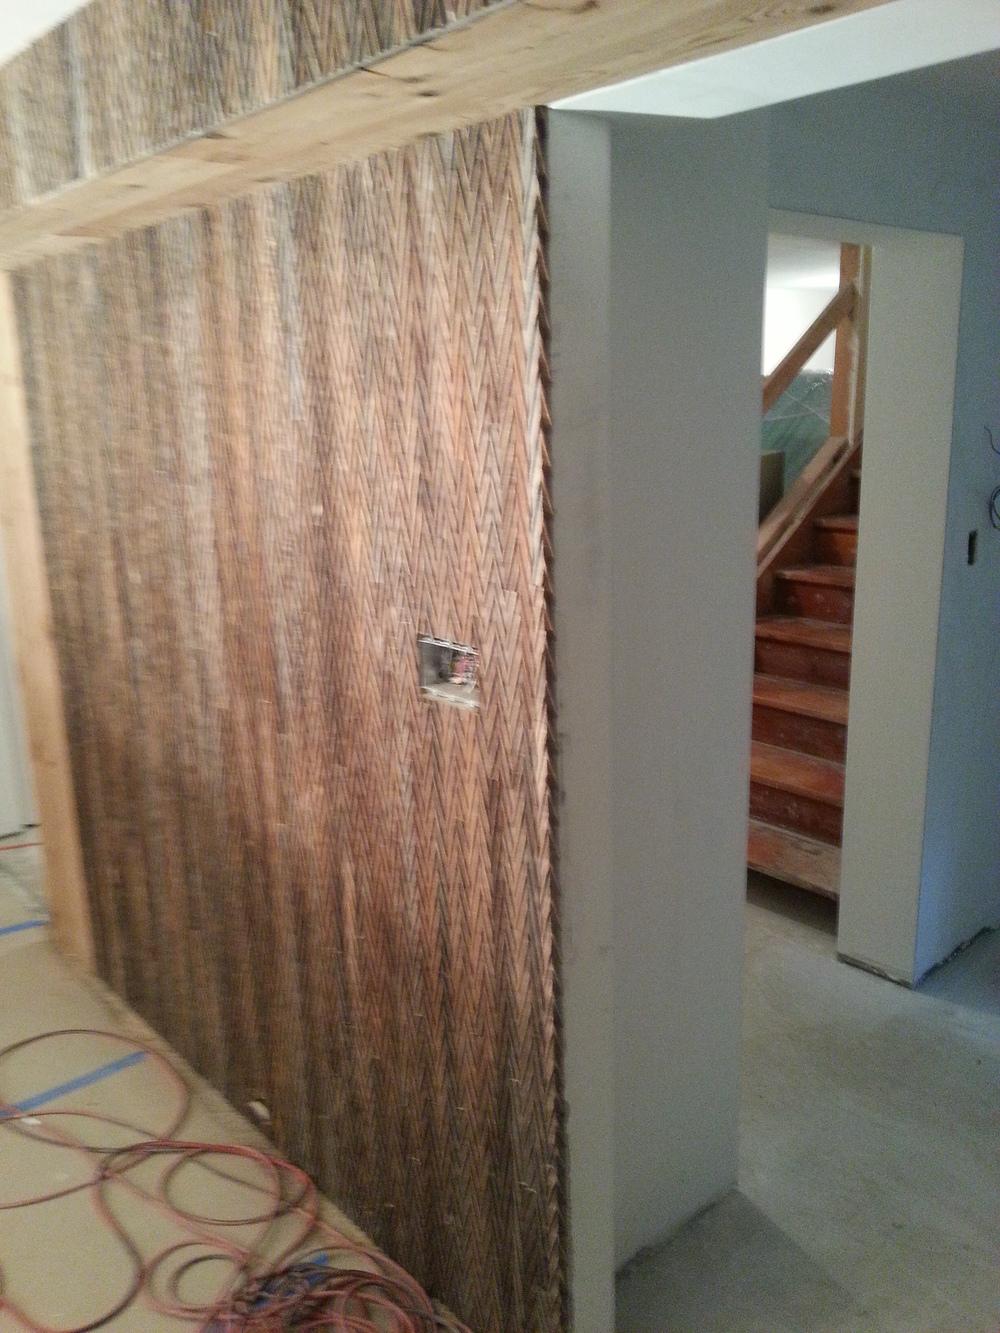 Etched Design Basement Panels